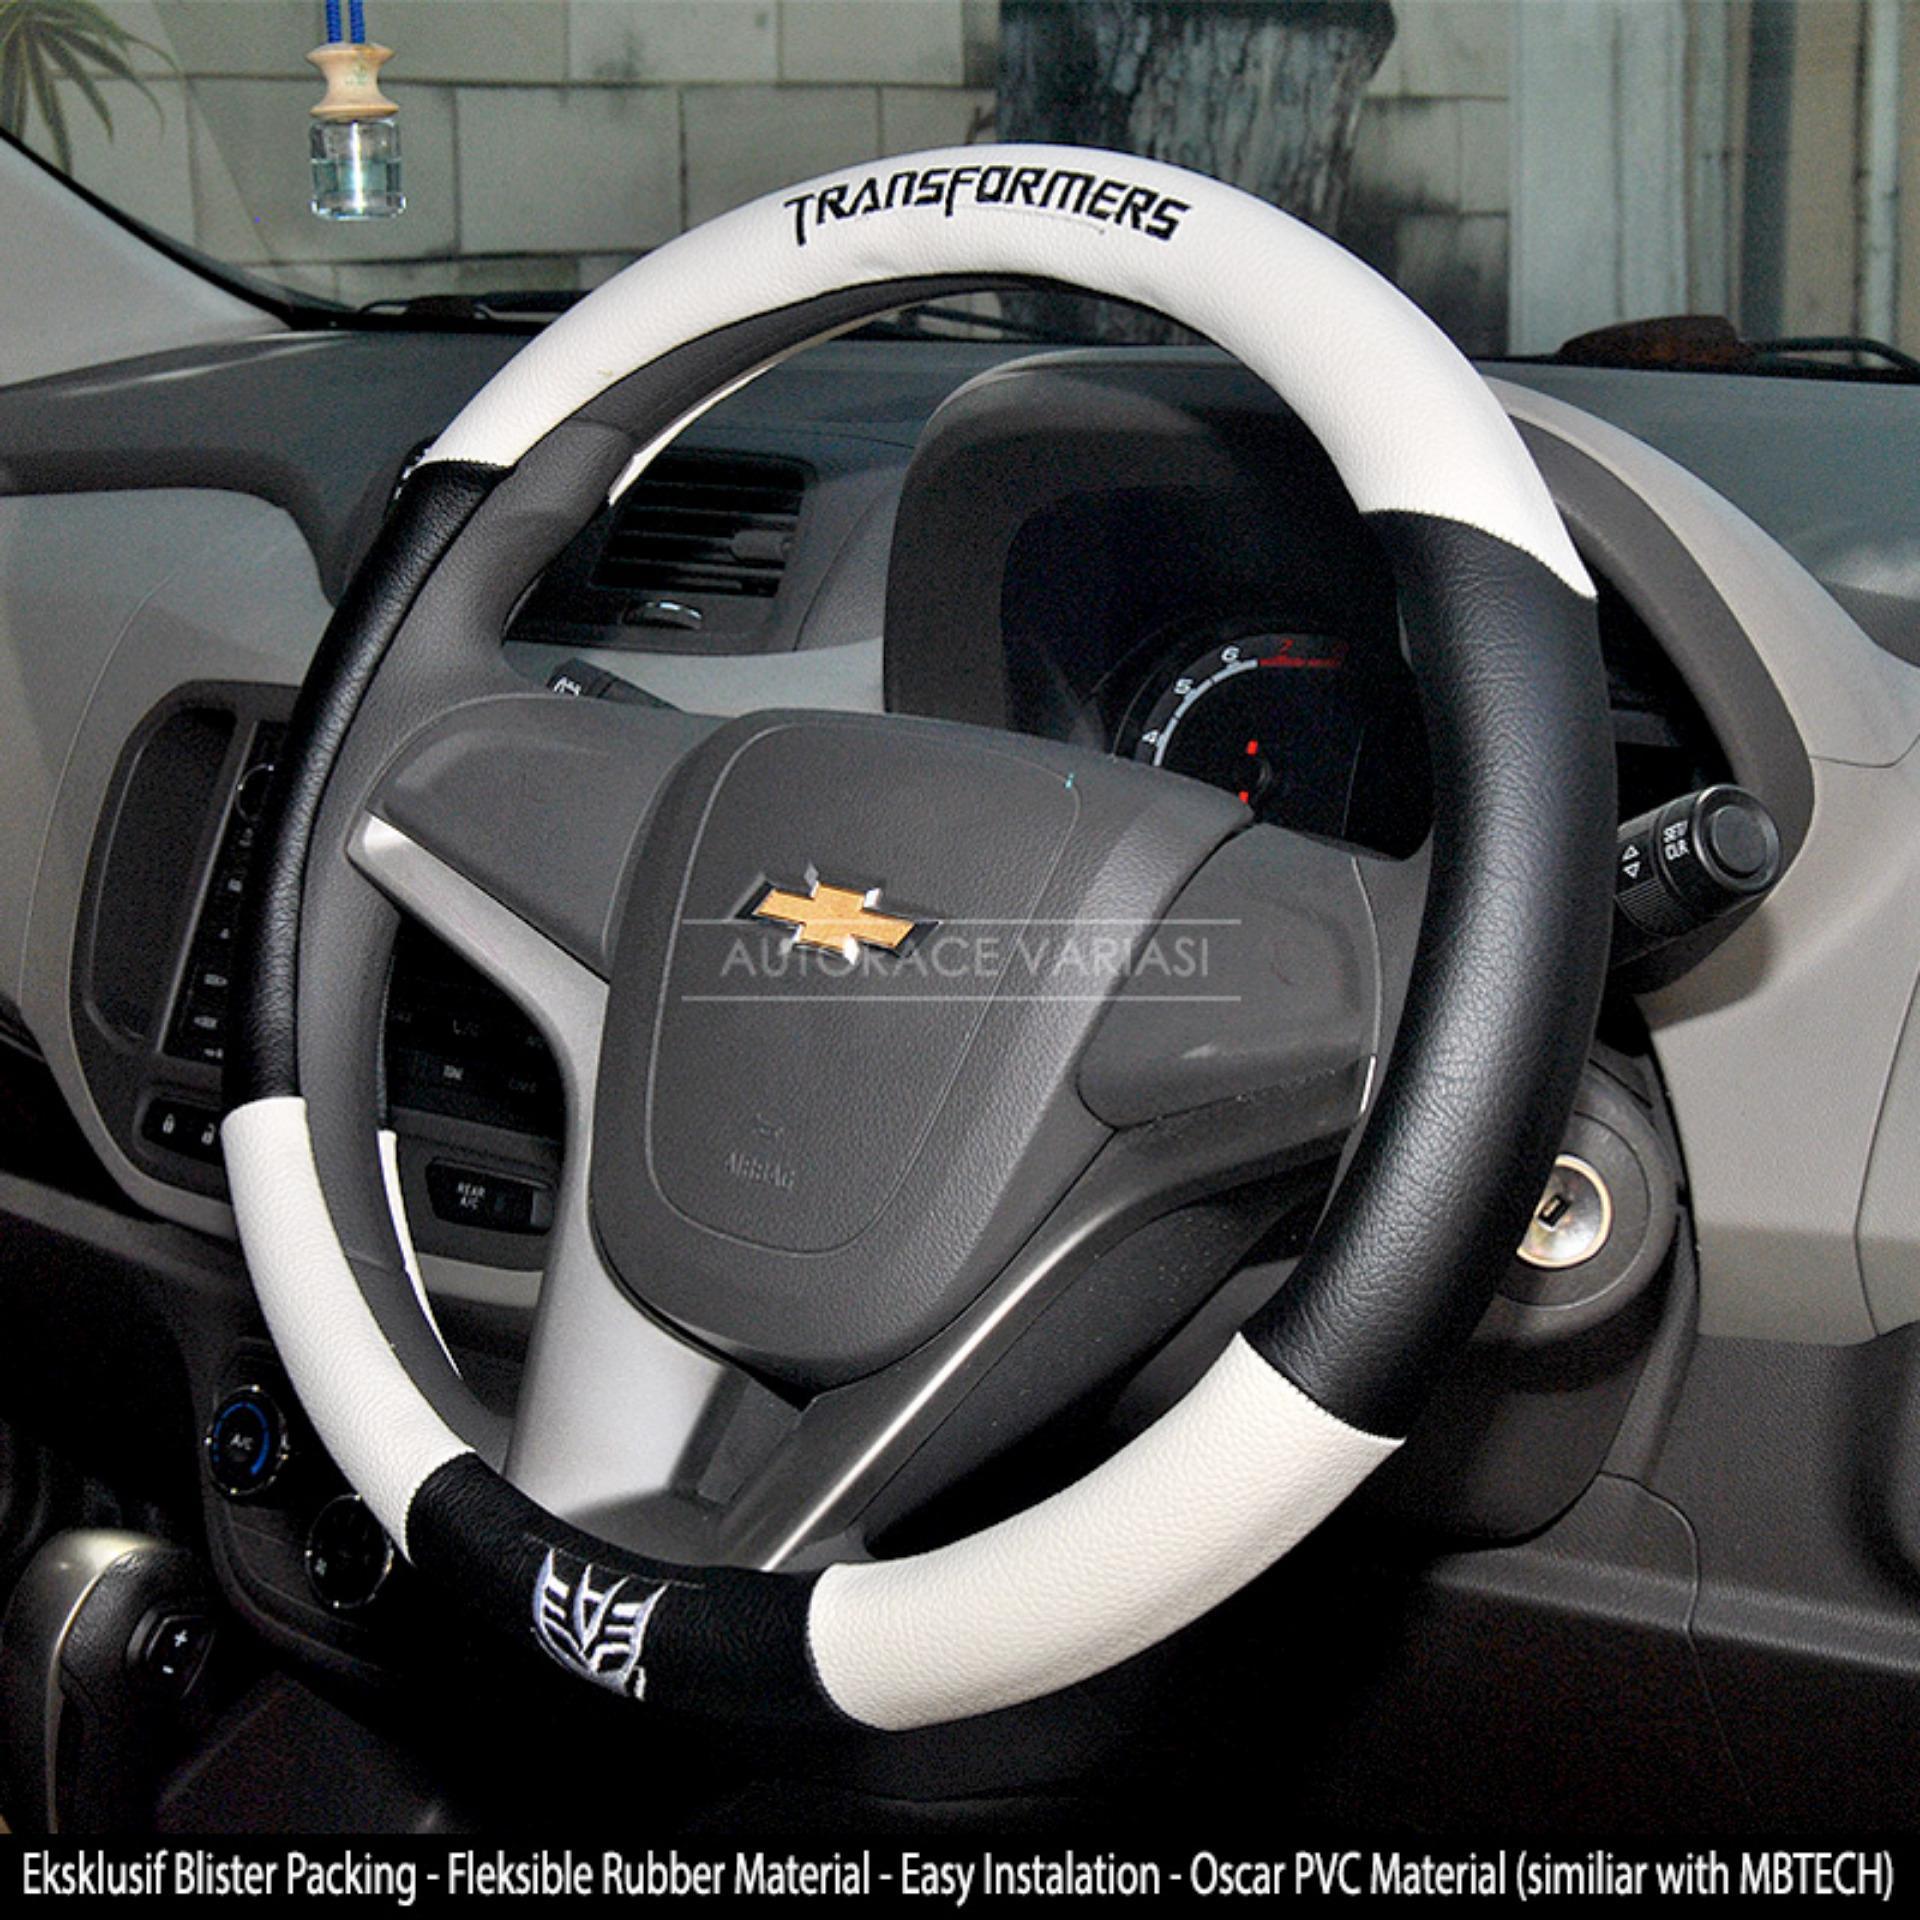 AUTORACE Cover Stir / Sarung / Aksesoris Pelindung Setir Mobil Universal Awet Kuat 104 Tranformrs -